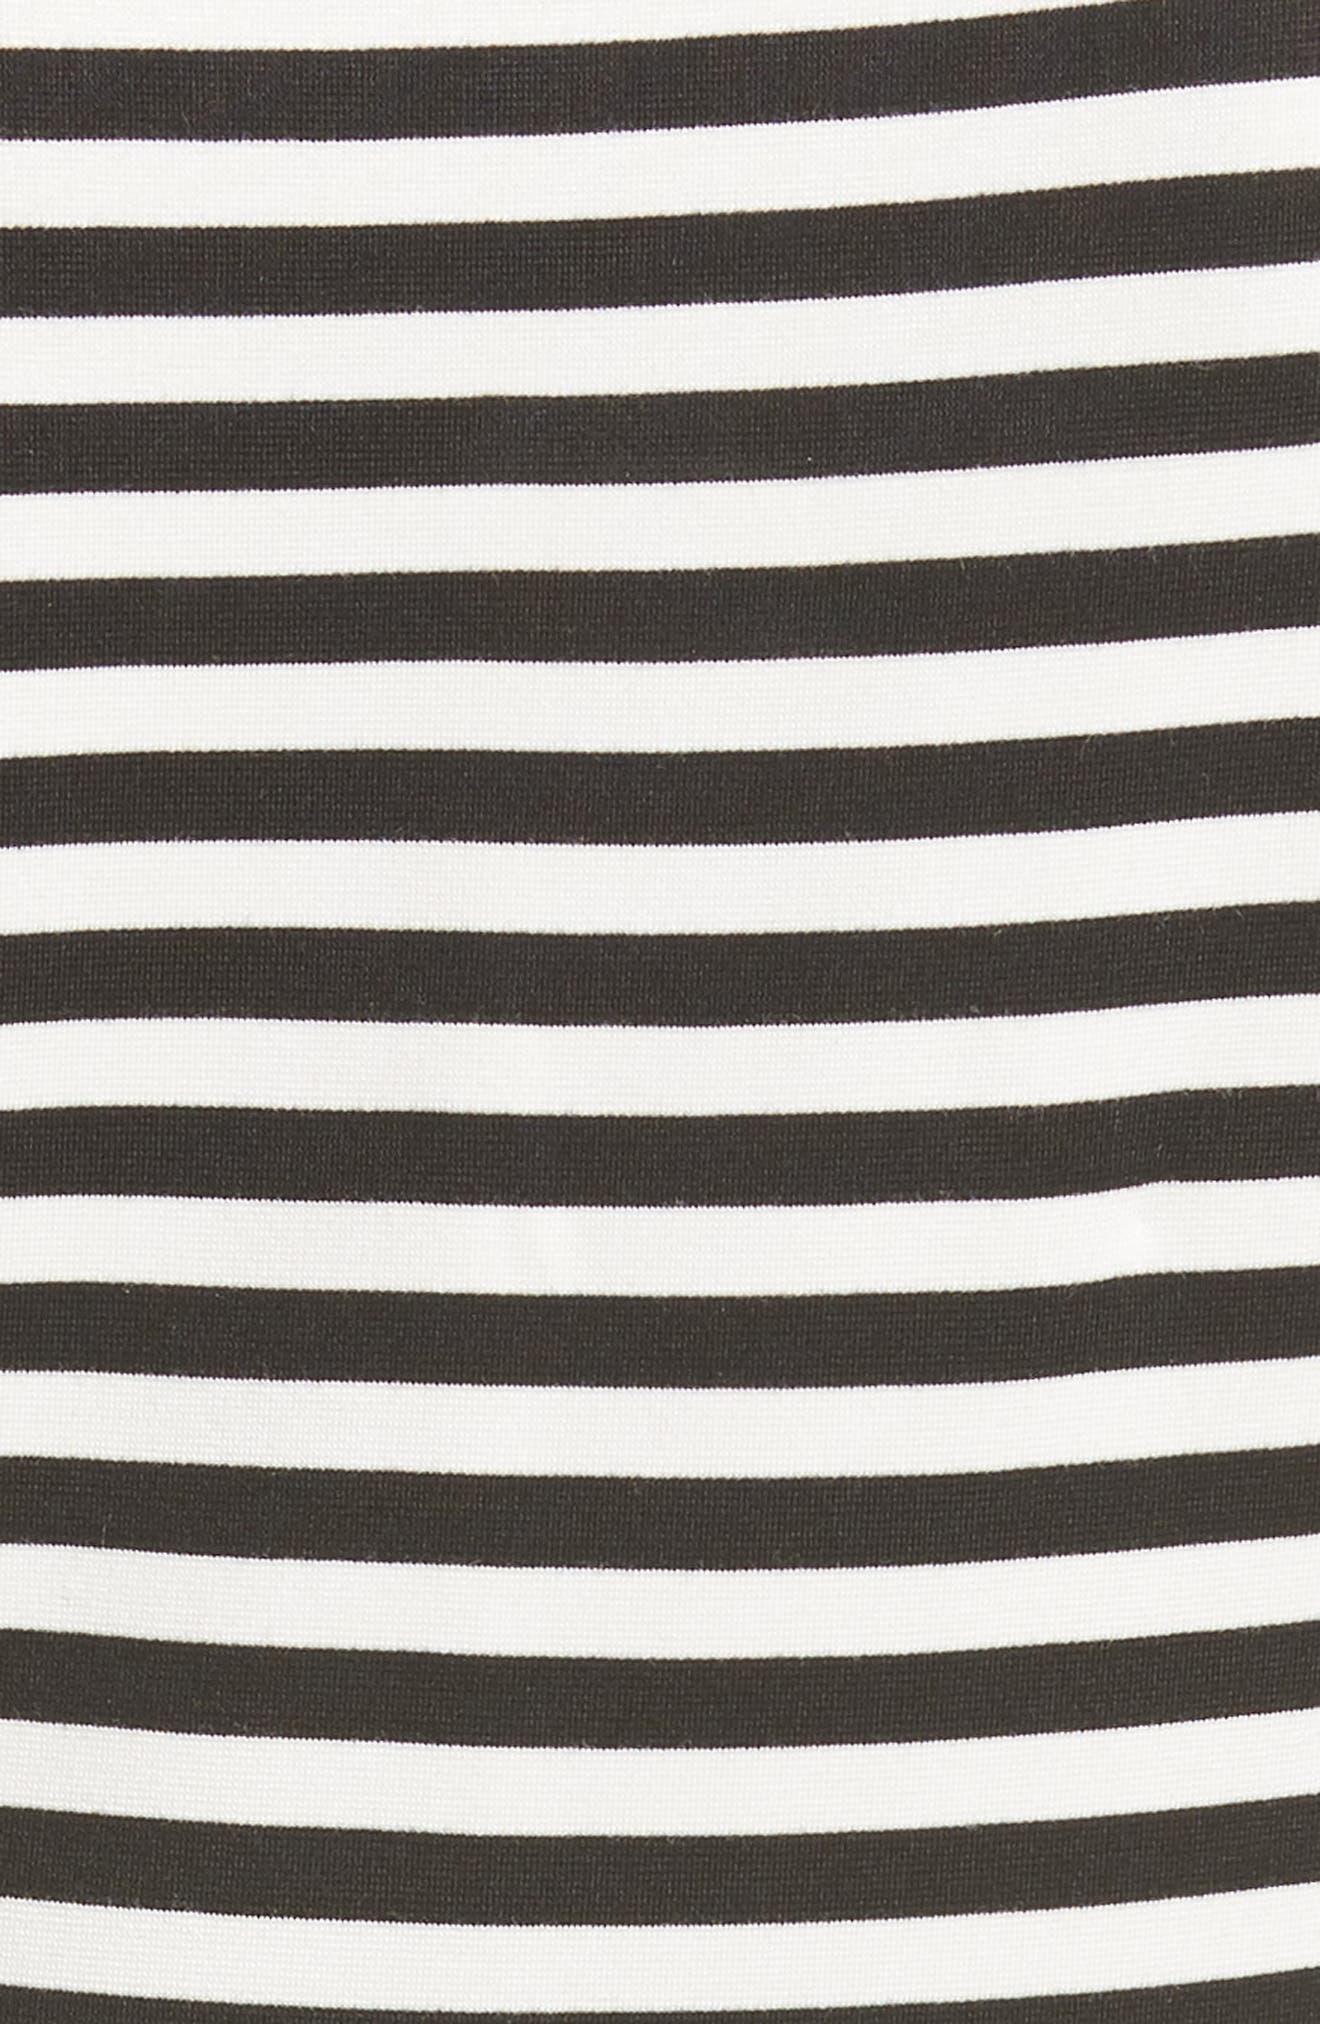 KATE SPADE NEW YORK,                             stripe ponte dress,                             Alternate thumbnail 5, color,                             900